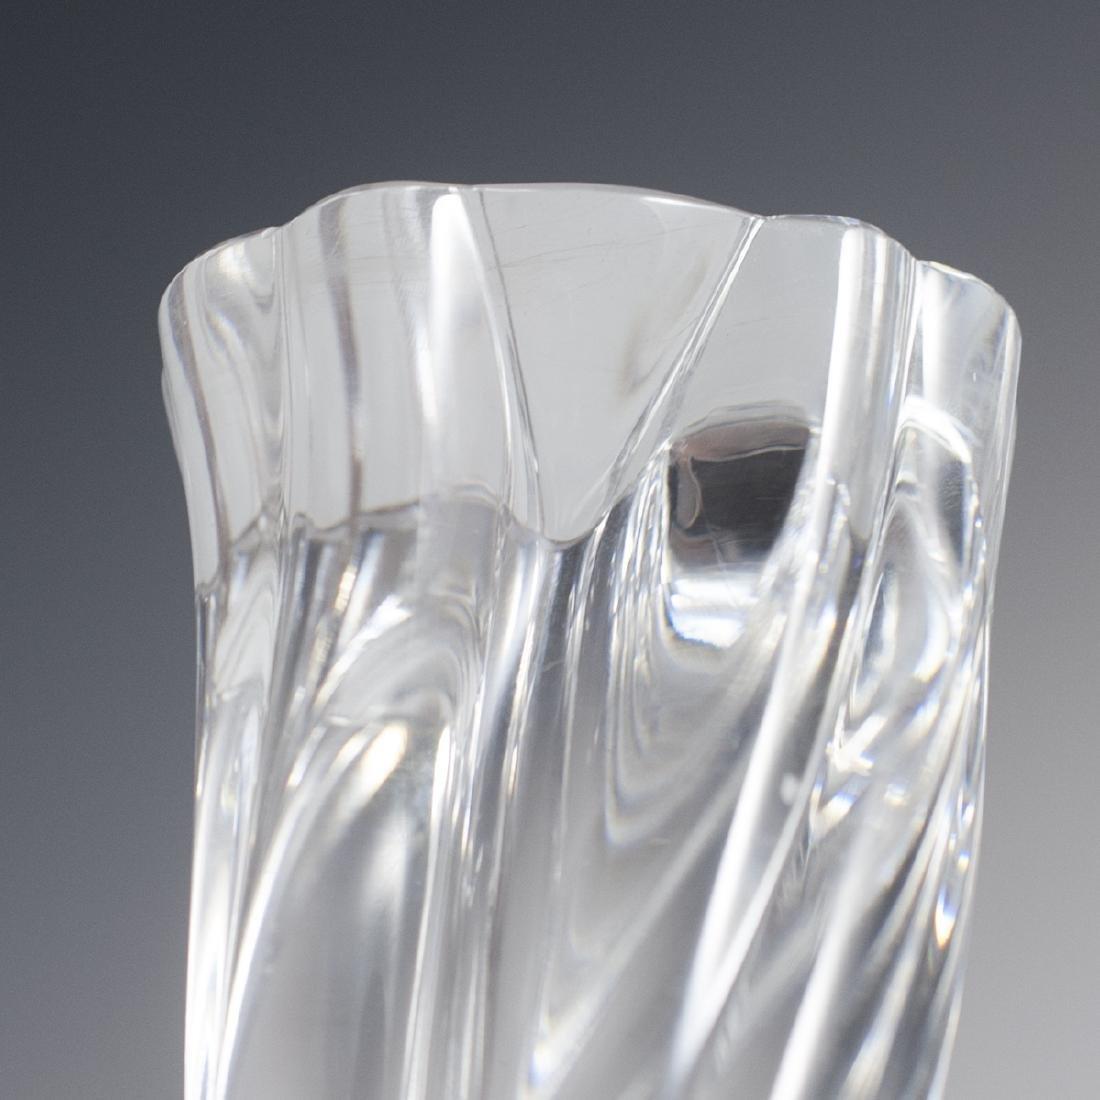 Baccarat Crystal Candlesticks - 4